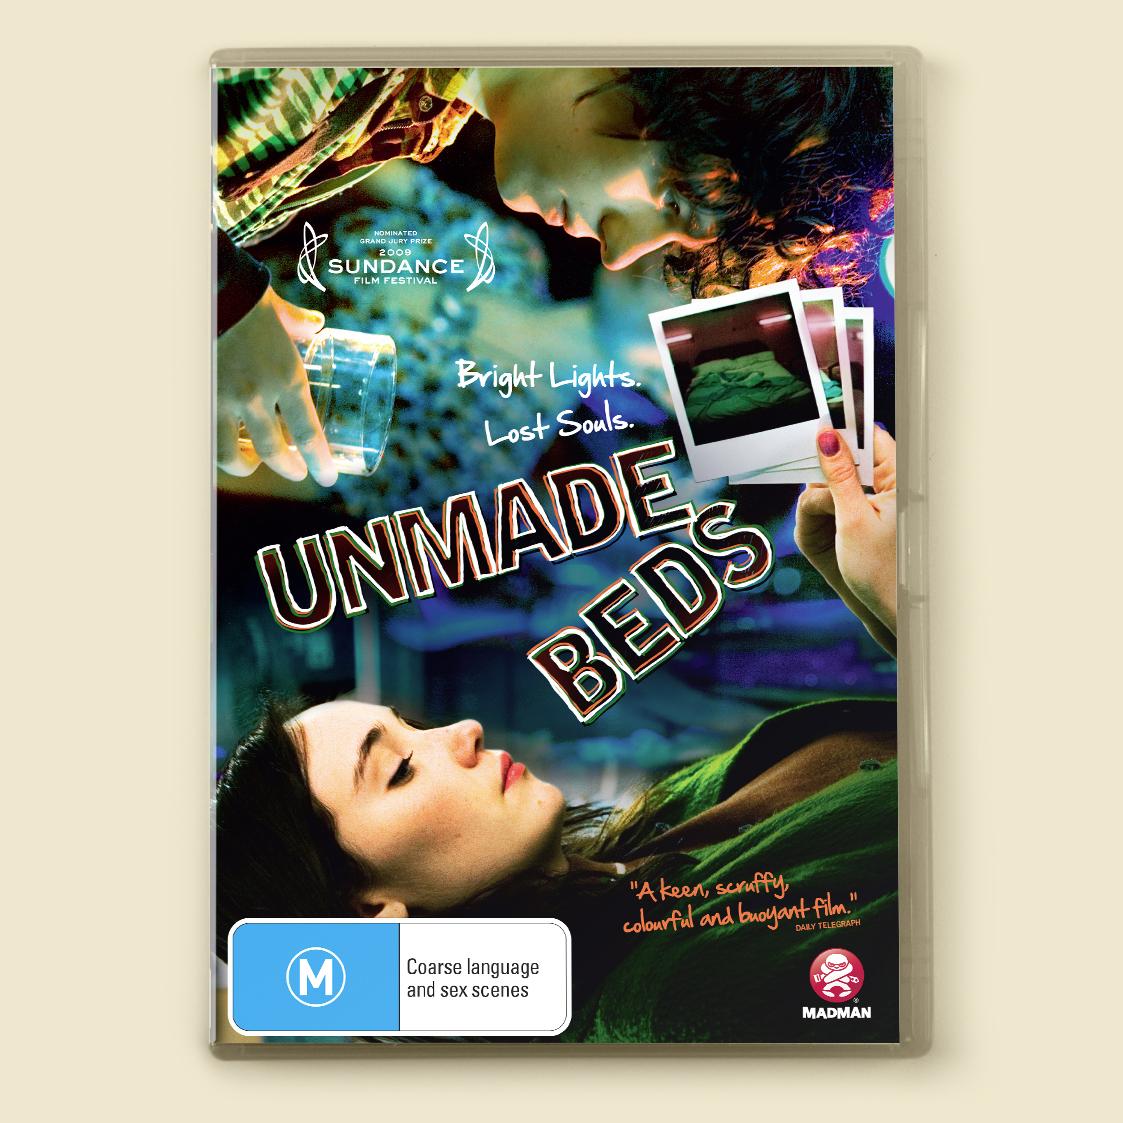 09_UnmadeBeds.jpg